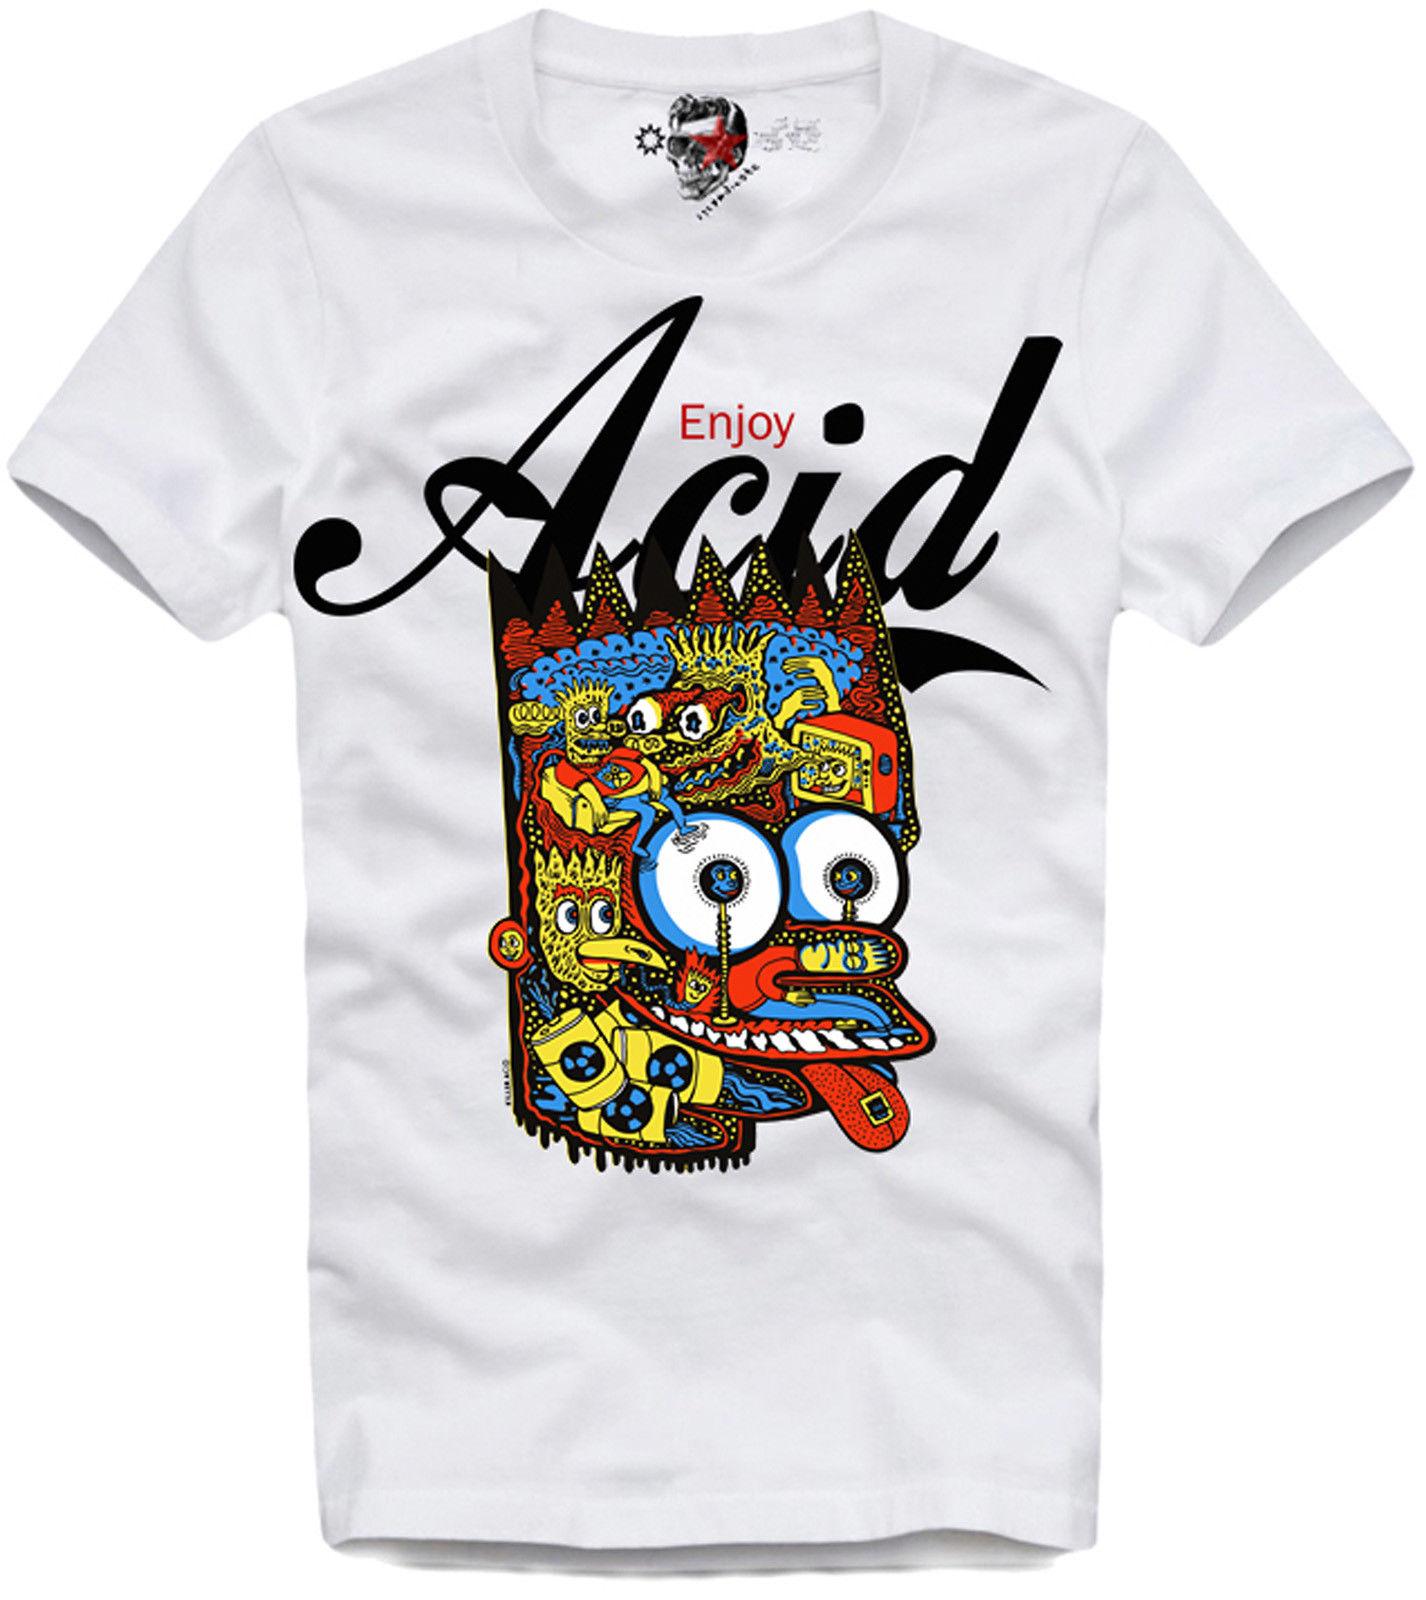 US $11 59 42% OFF|T SHIRT ENJOY ACID LSD MESKALIN 2C B AL LAD DMT MEO 3457  Cool Casual Pride T Shirt Men Unisex New Fashion Tshirt Loose-in T-Shirts